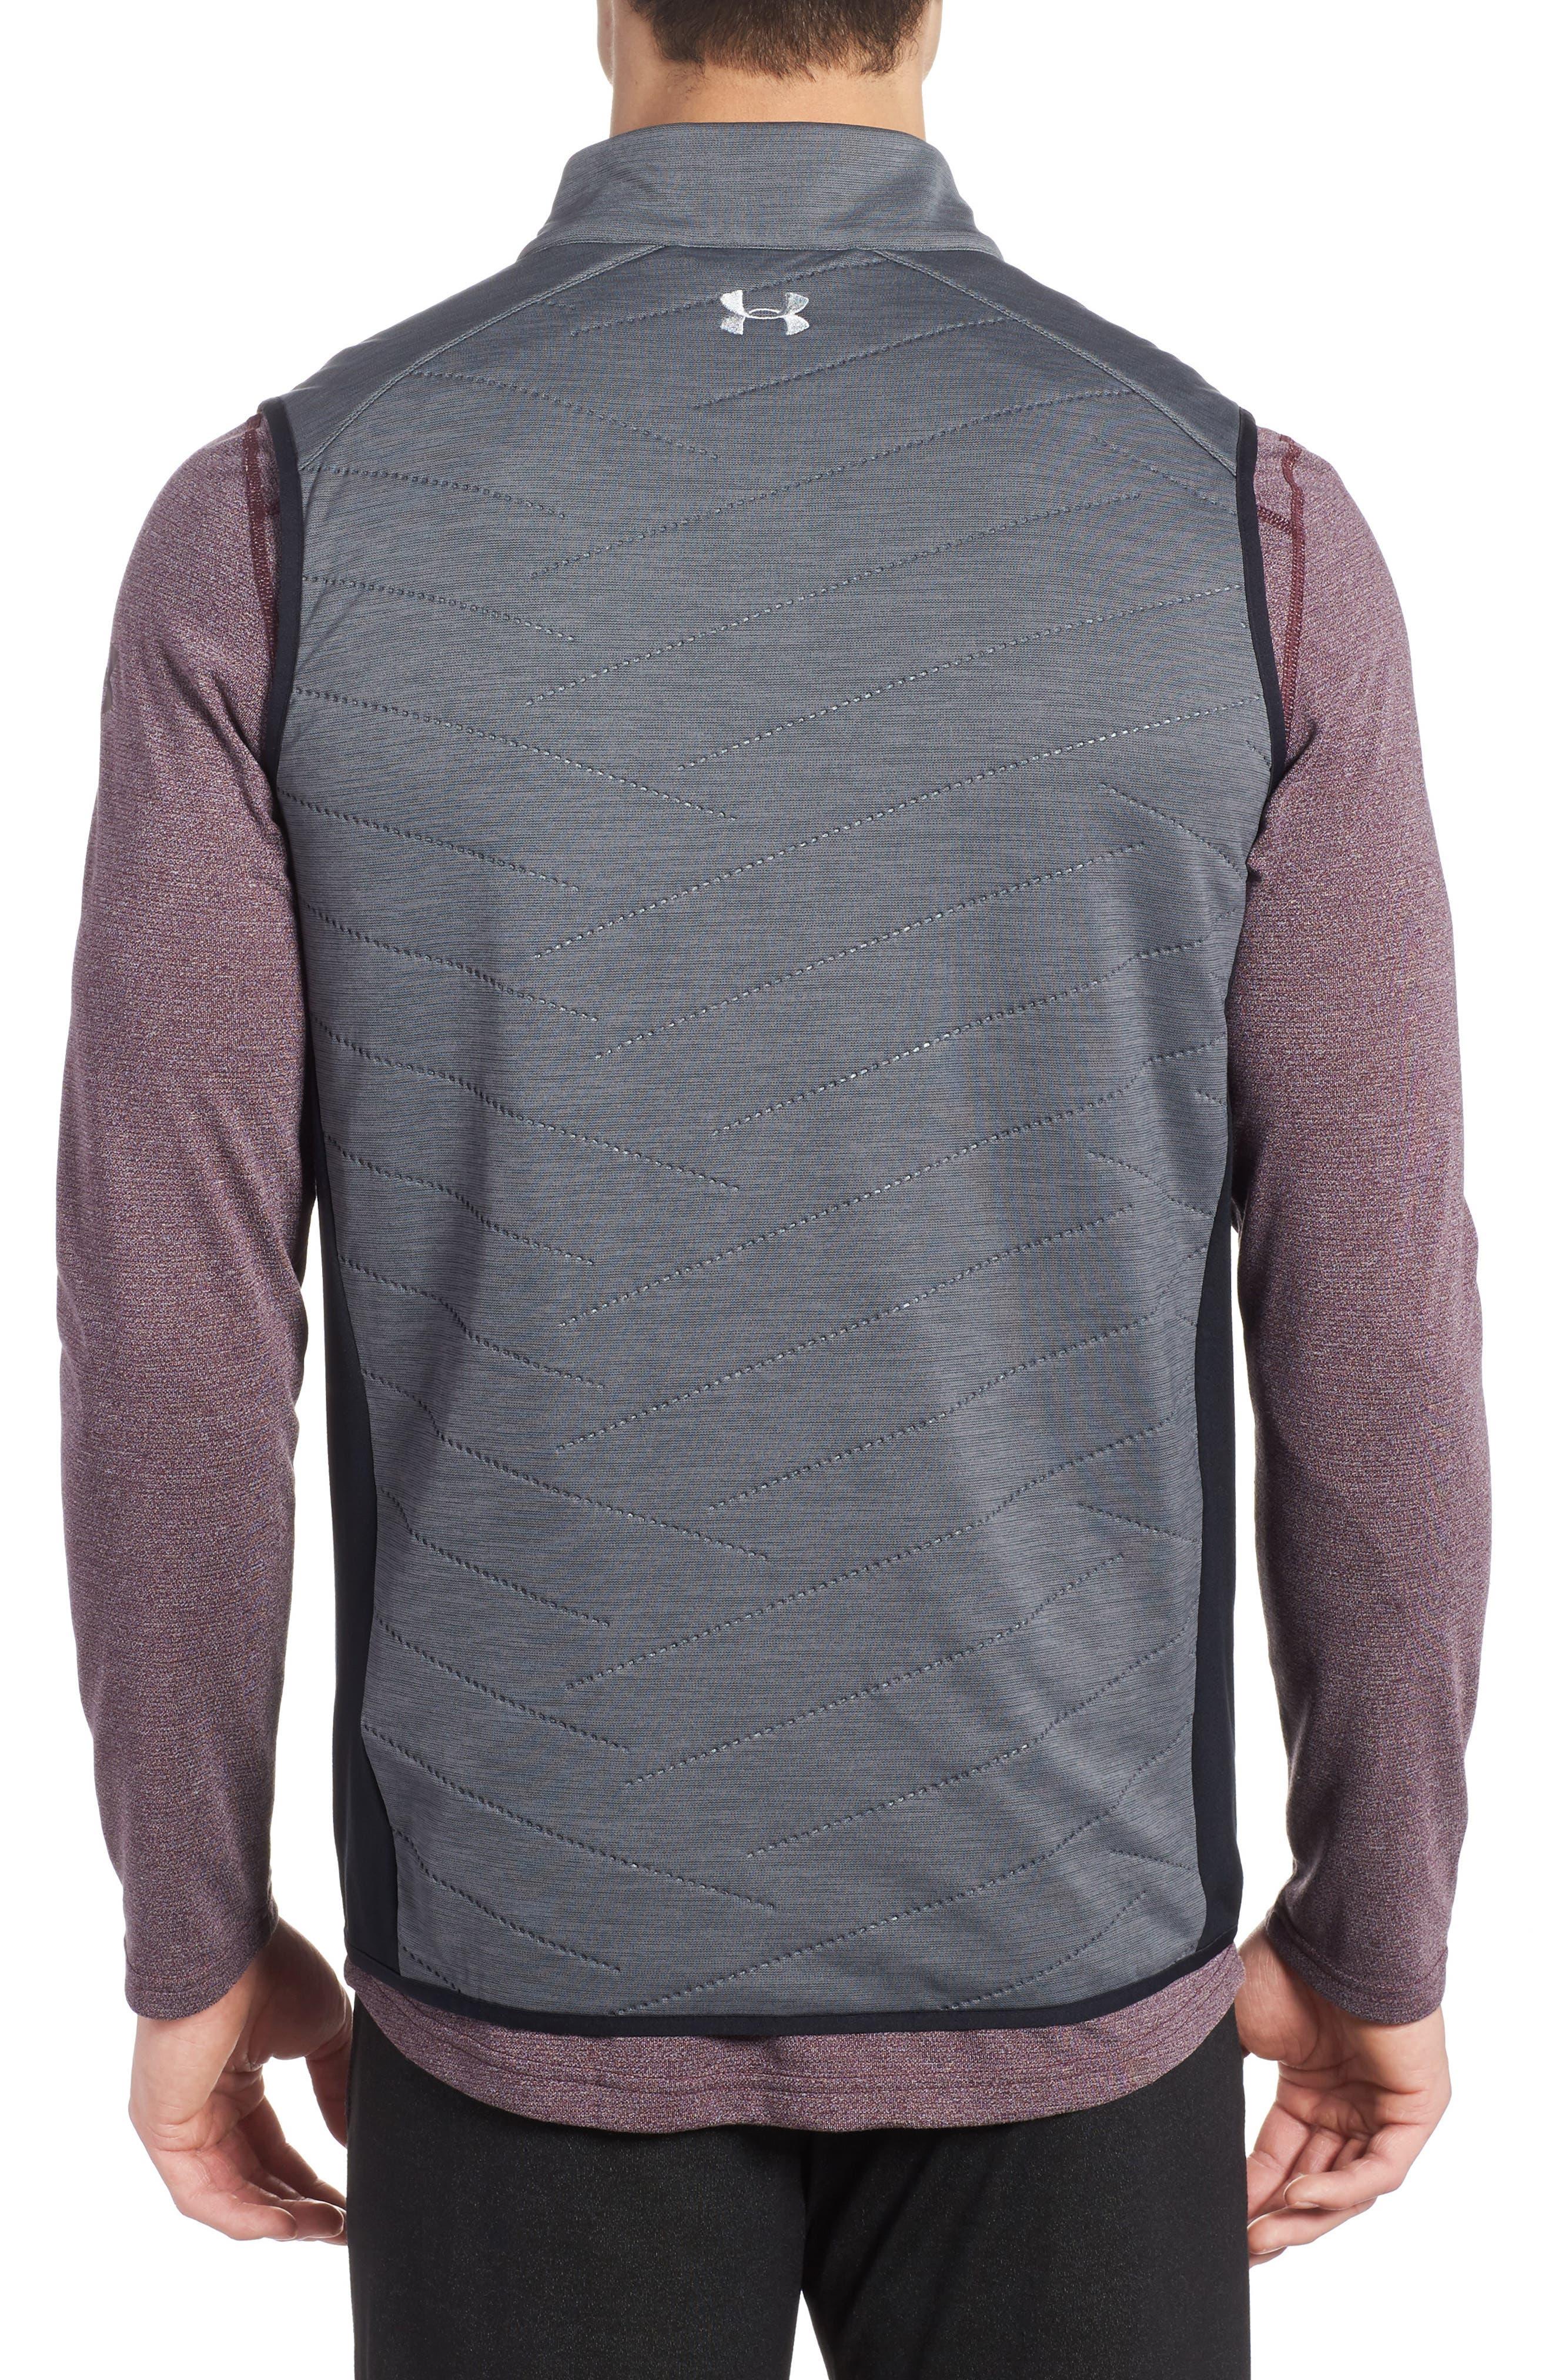 Reactor Hybrid Zip Vest,                             Alternate thumbnail 2, color,                             Rhino Grey / Black / Grey